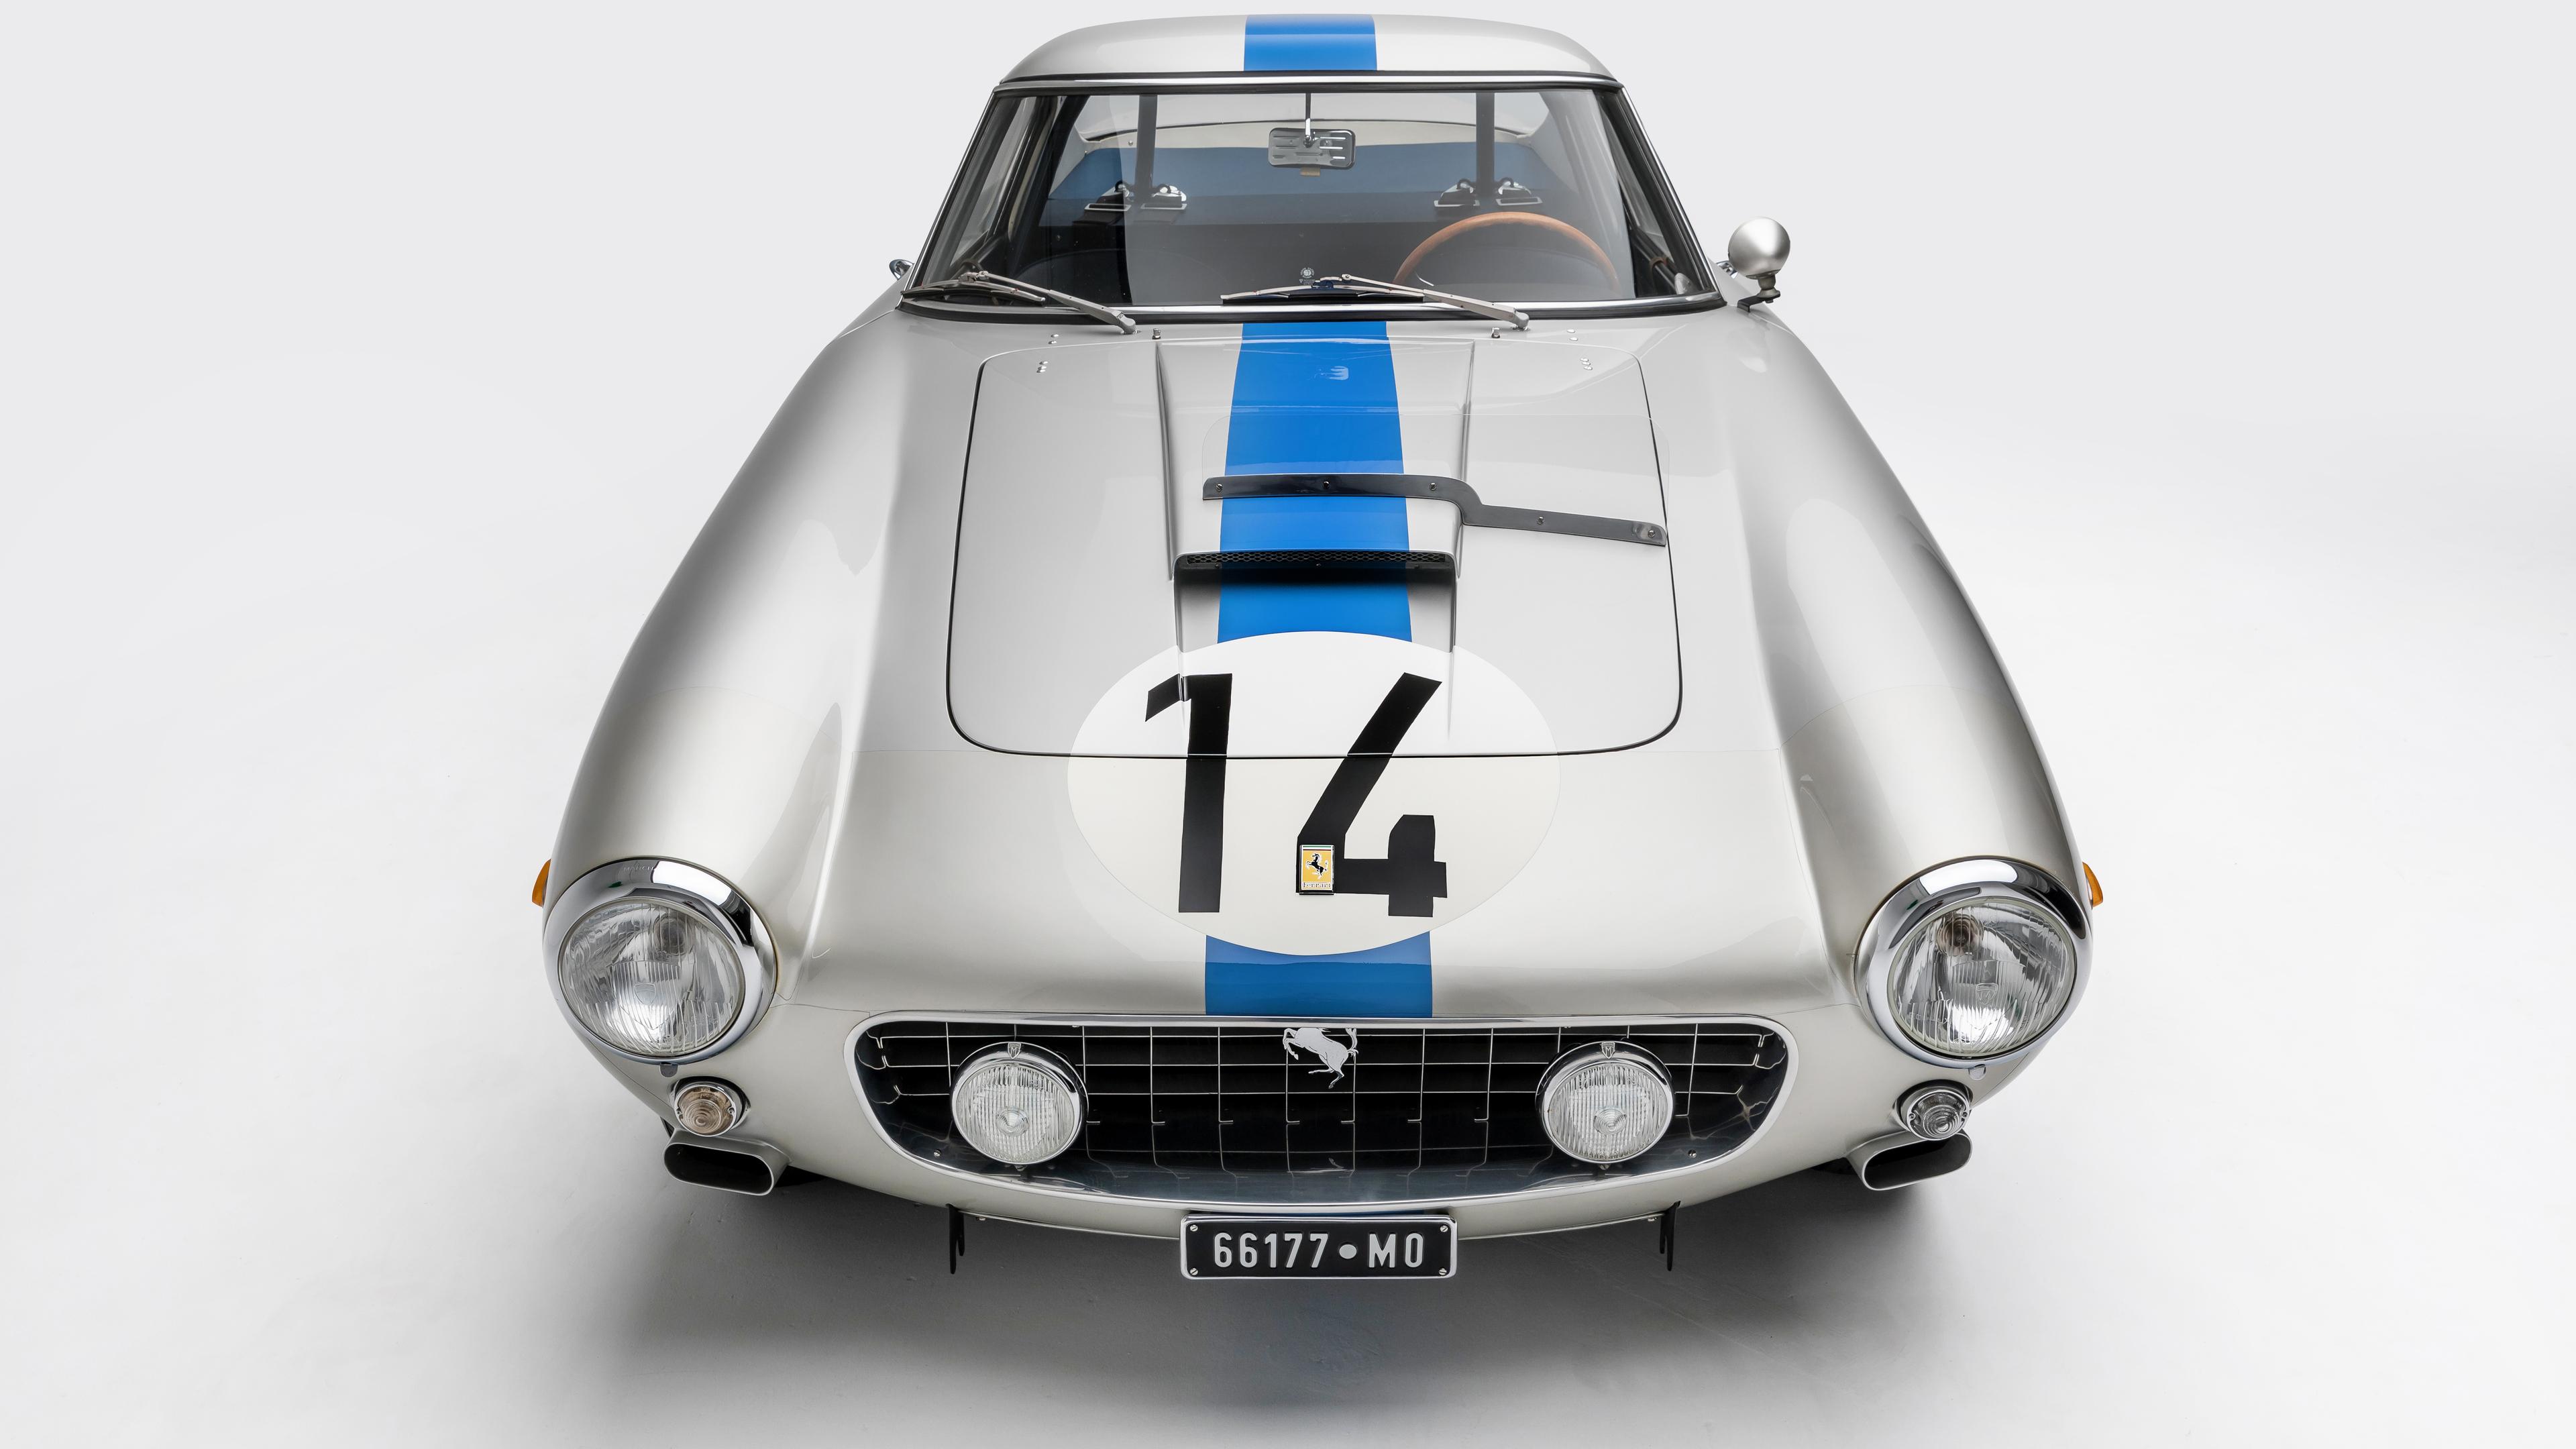 ferrari 250 gt 4k 1560534098 - Ferrari 250 GT 4k - hd-wallpapers, ferrari wallpapers, cars wallpapers, 4k-wallpapers